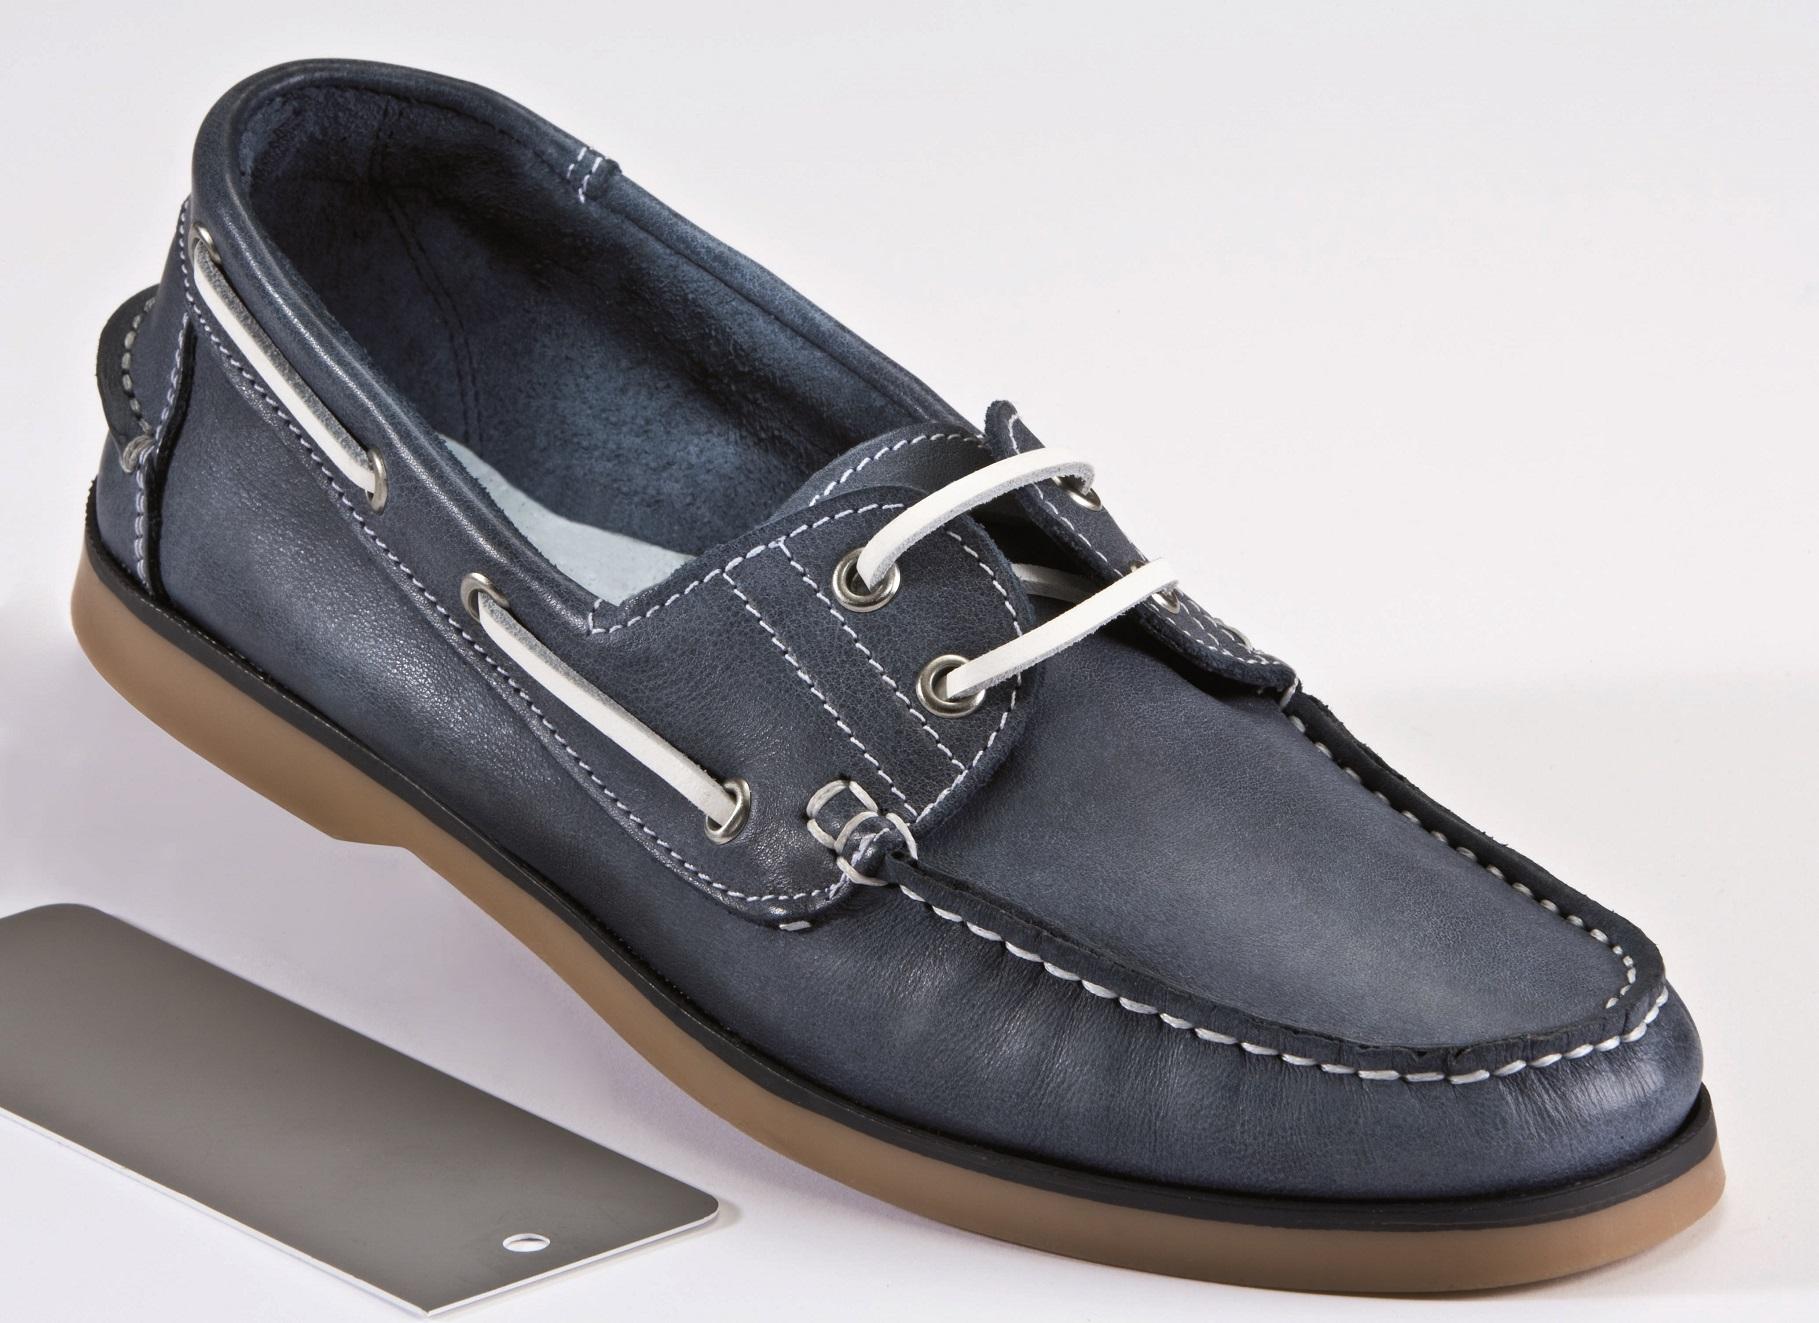 herren leder bootsschuh segelschuh slipper mokassins 44 farbe navy maritim neu ebay. Black Bedroom Furniture Sets. Home Design Ideas